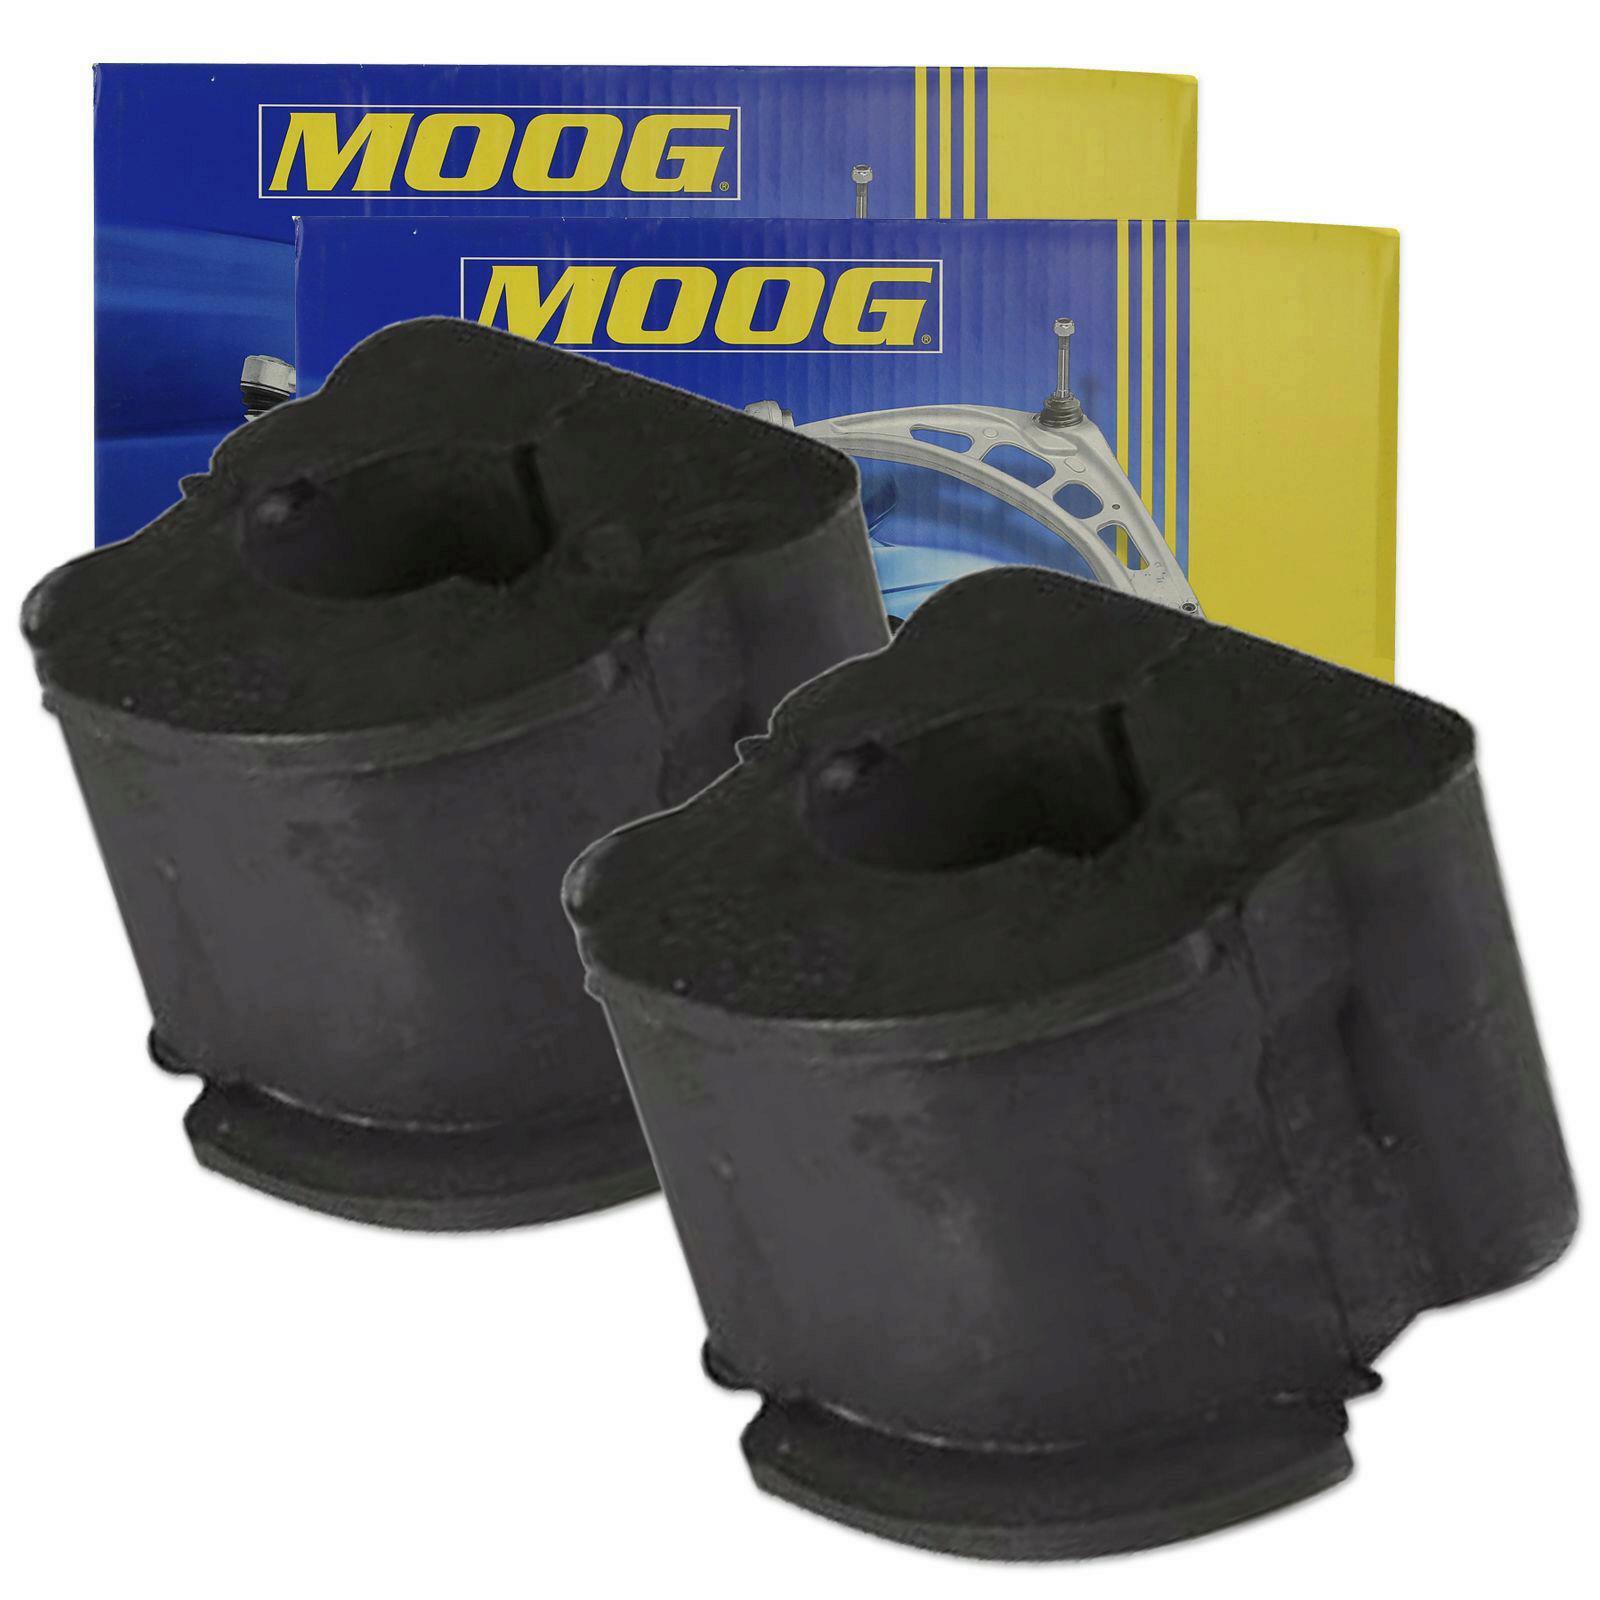 2x MOOG Lagerbuchse